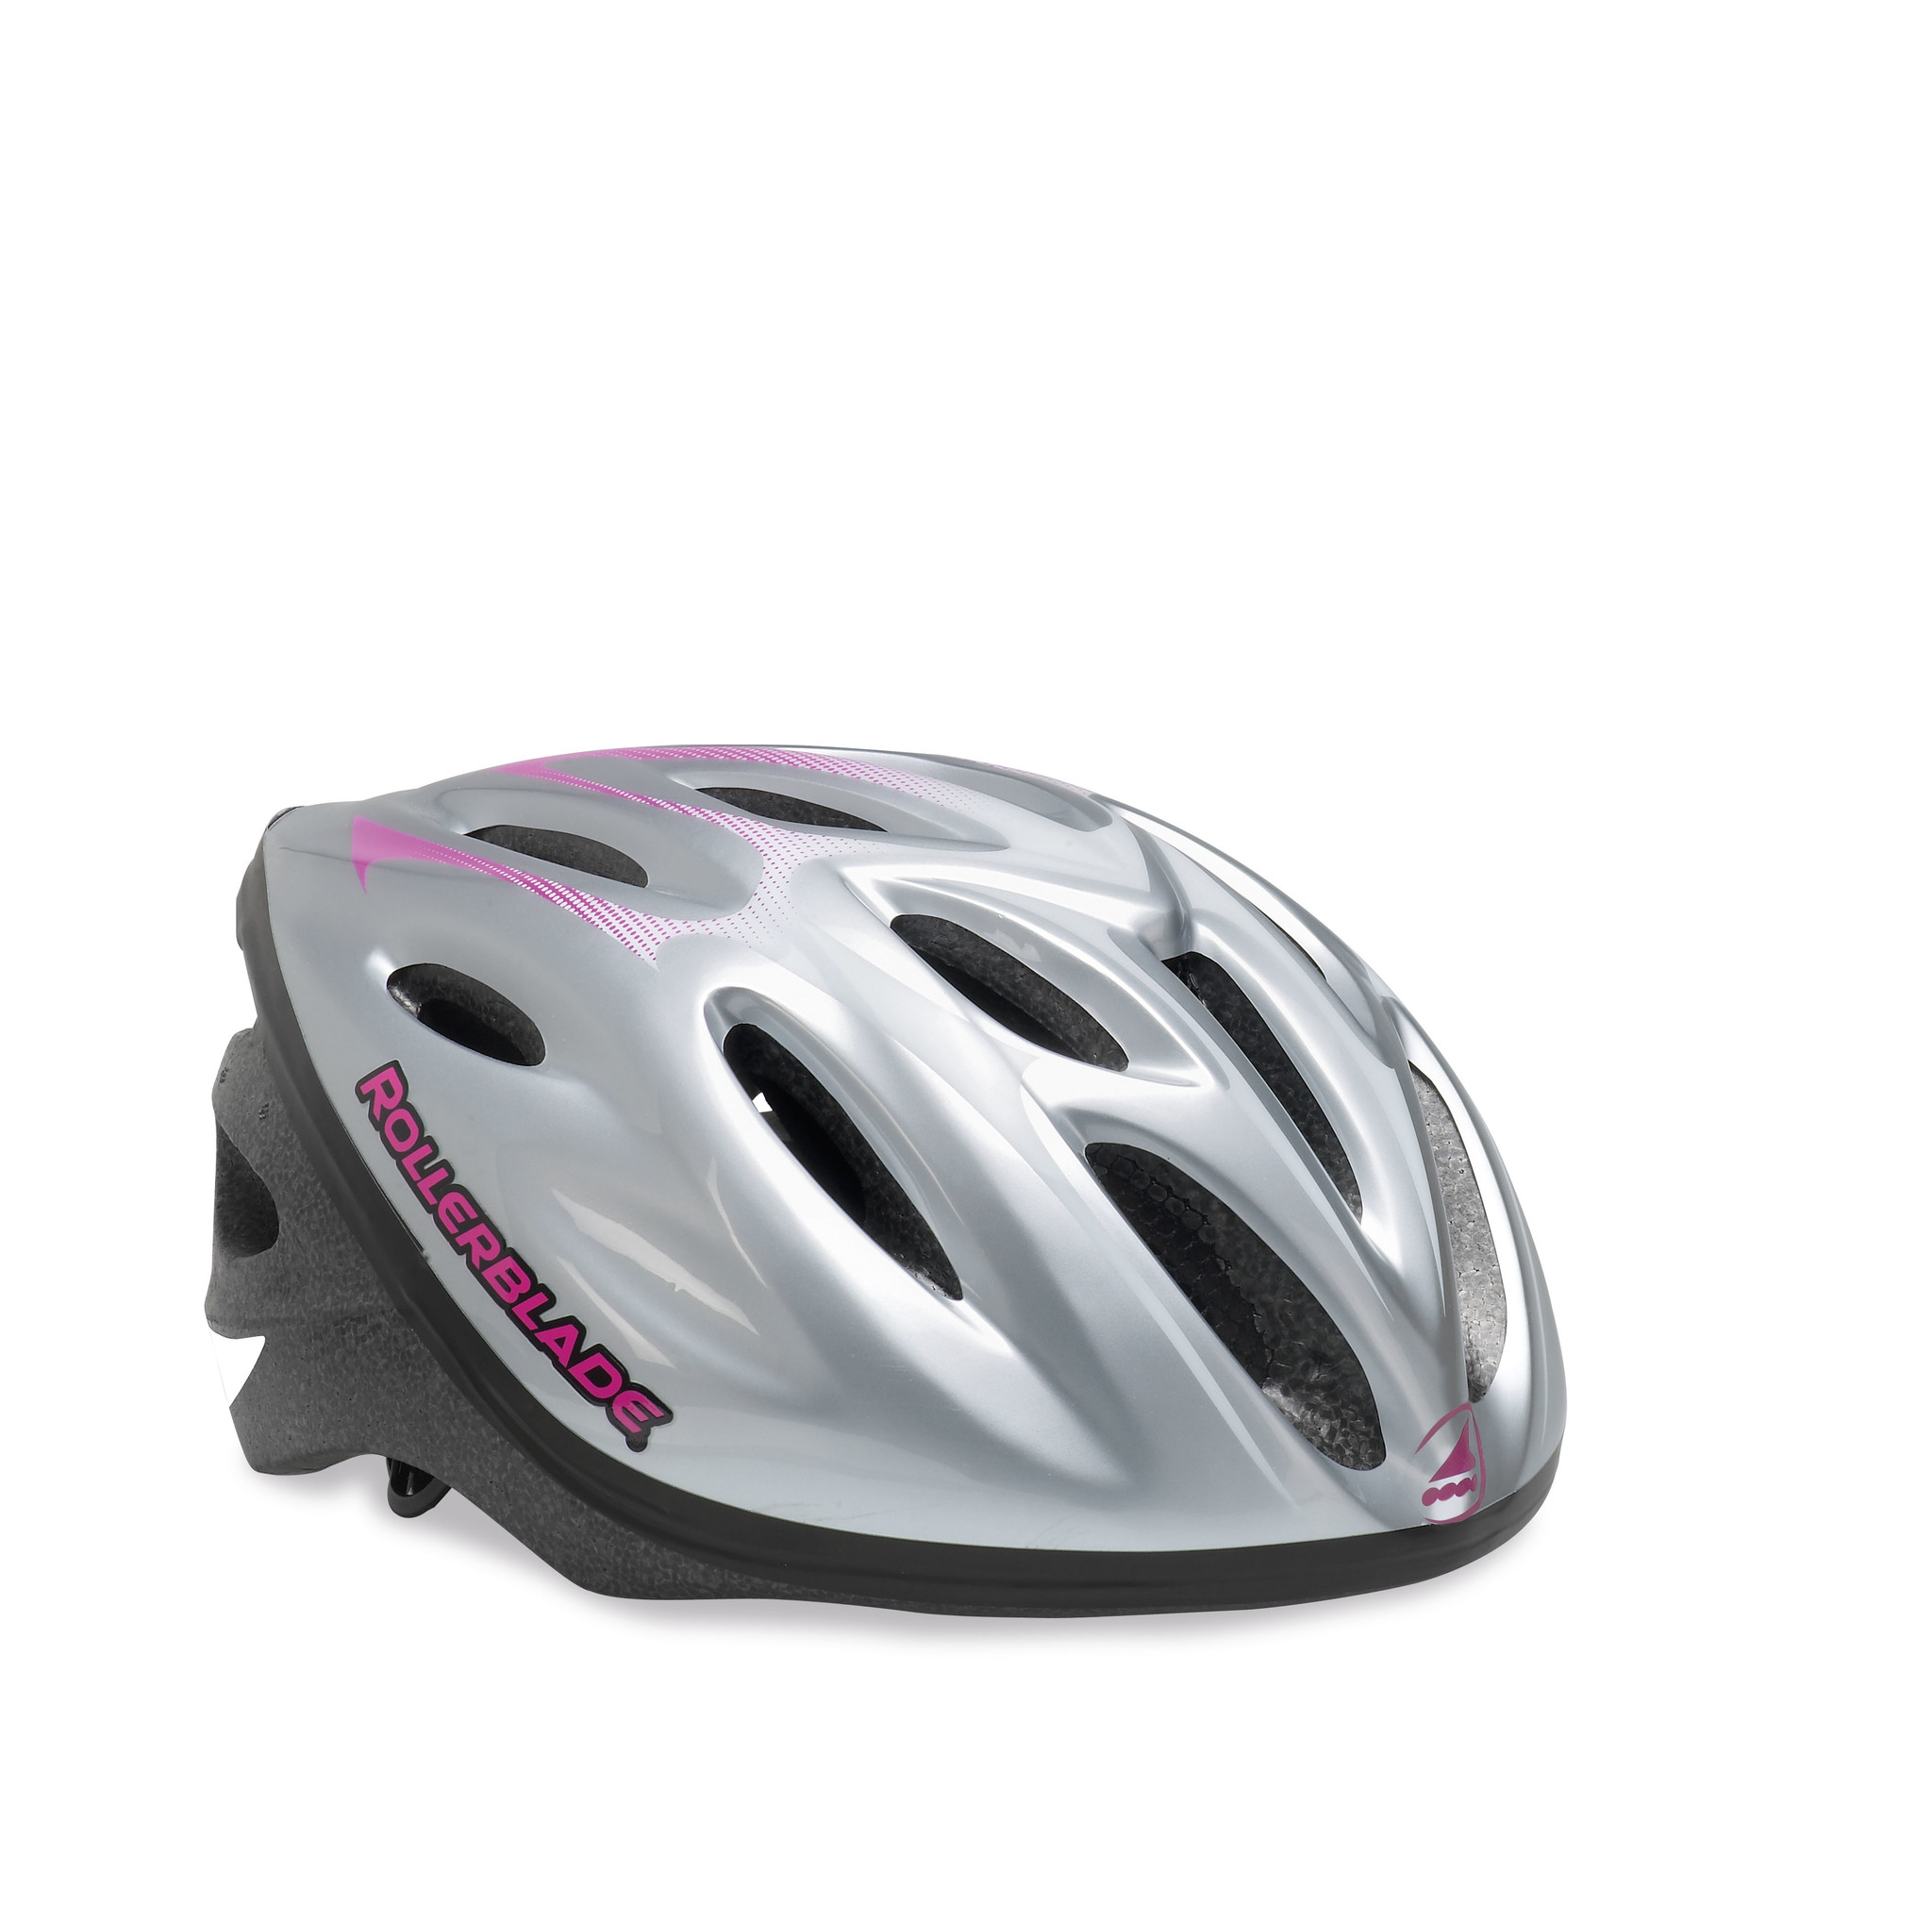 Rollerblade Workout Helmet Silver/Purple